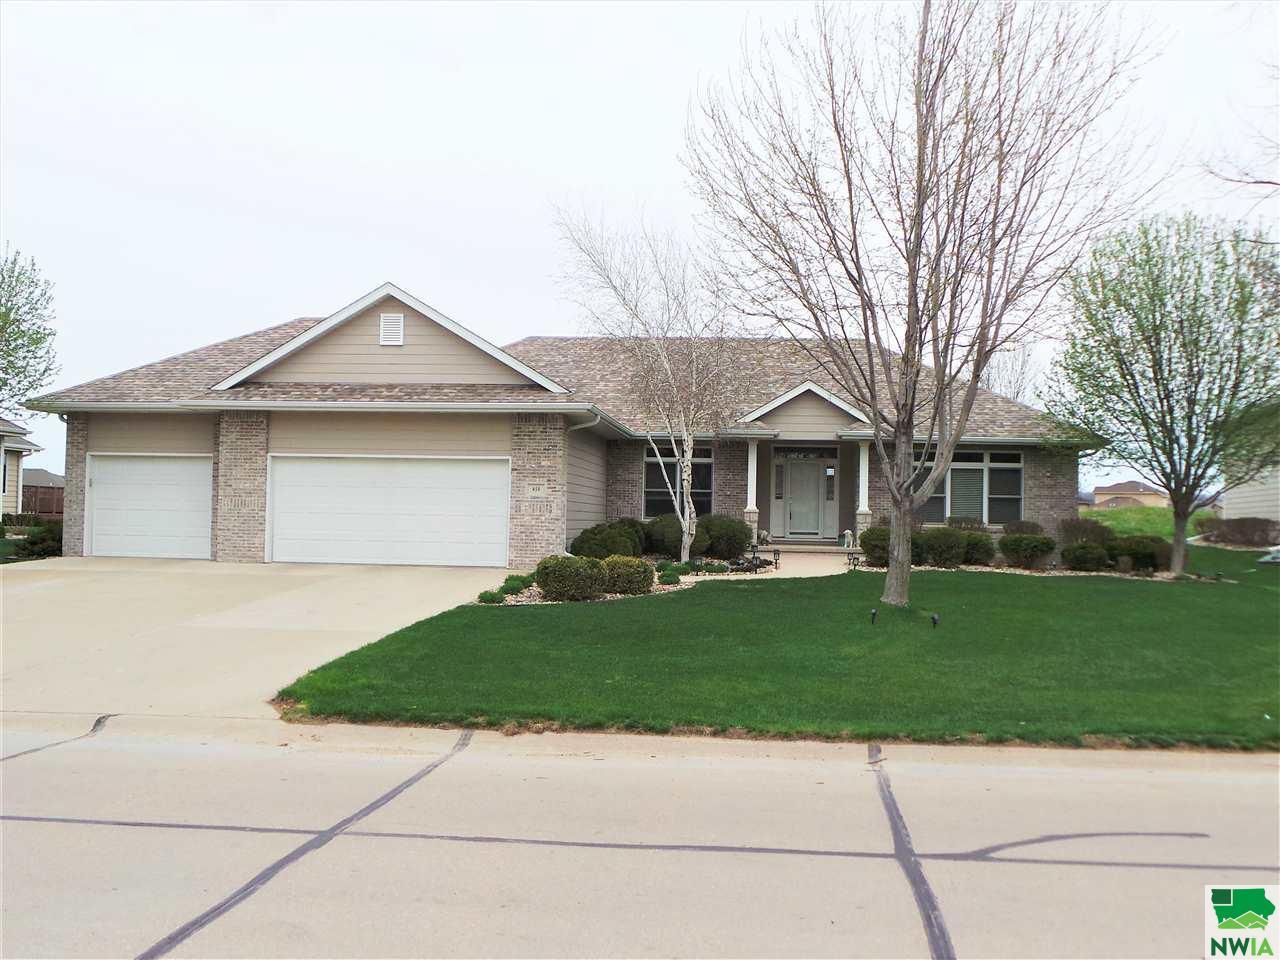 Property for sale at 459 East Sawgrass Trail, Dakota Dunes,  SD 57049